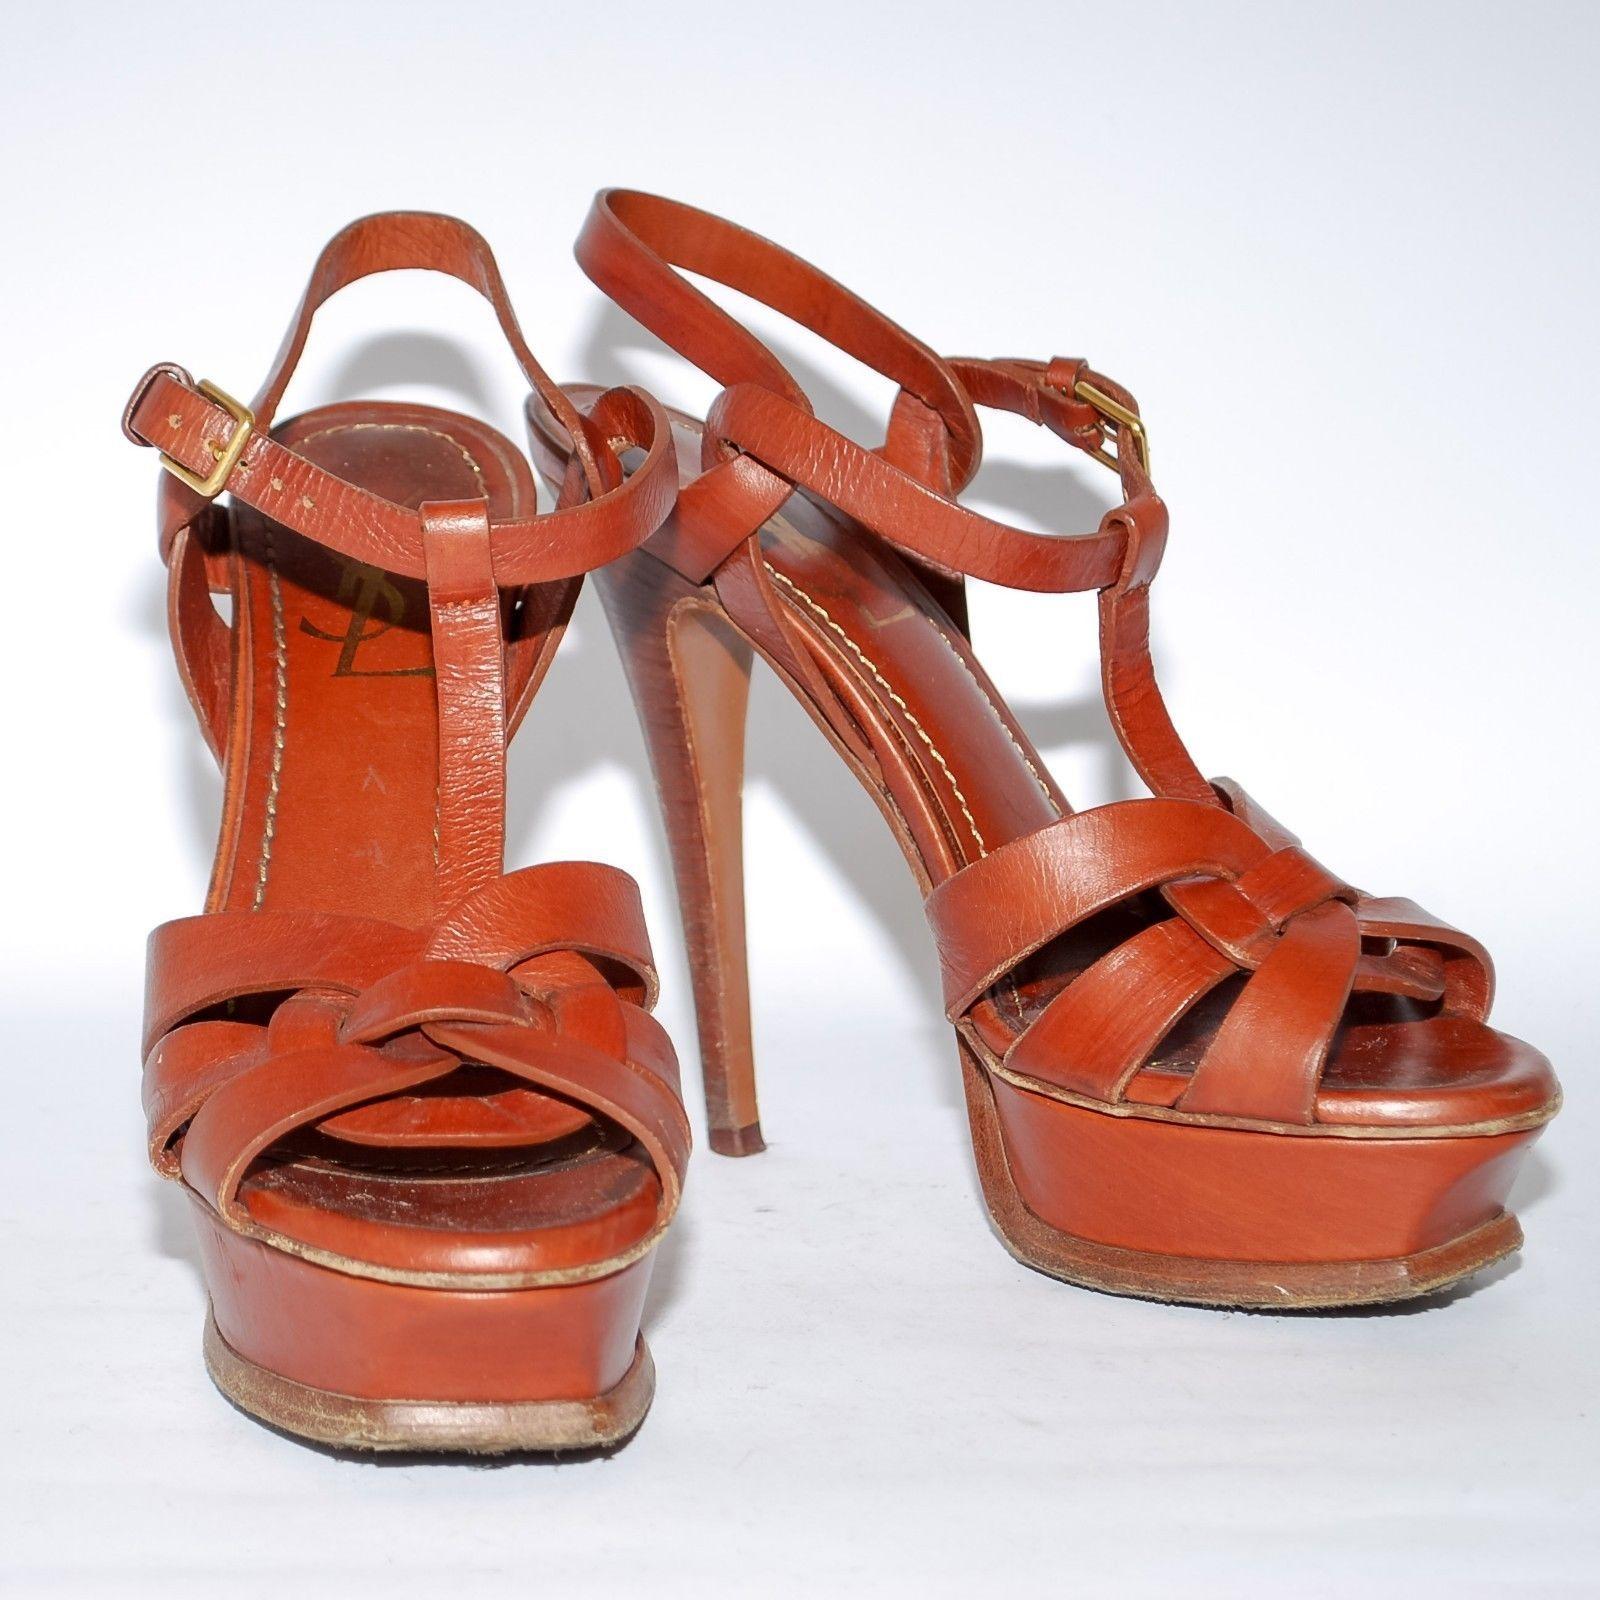 8b454fb6198 S l1600. S l1600. Previous. Yves Saint Laurent Brown Tribute Patent Leather  High Heels Sandals Pumps ...